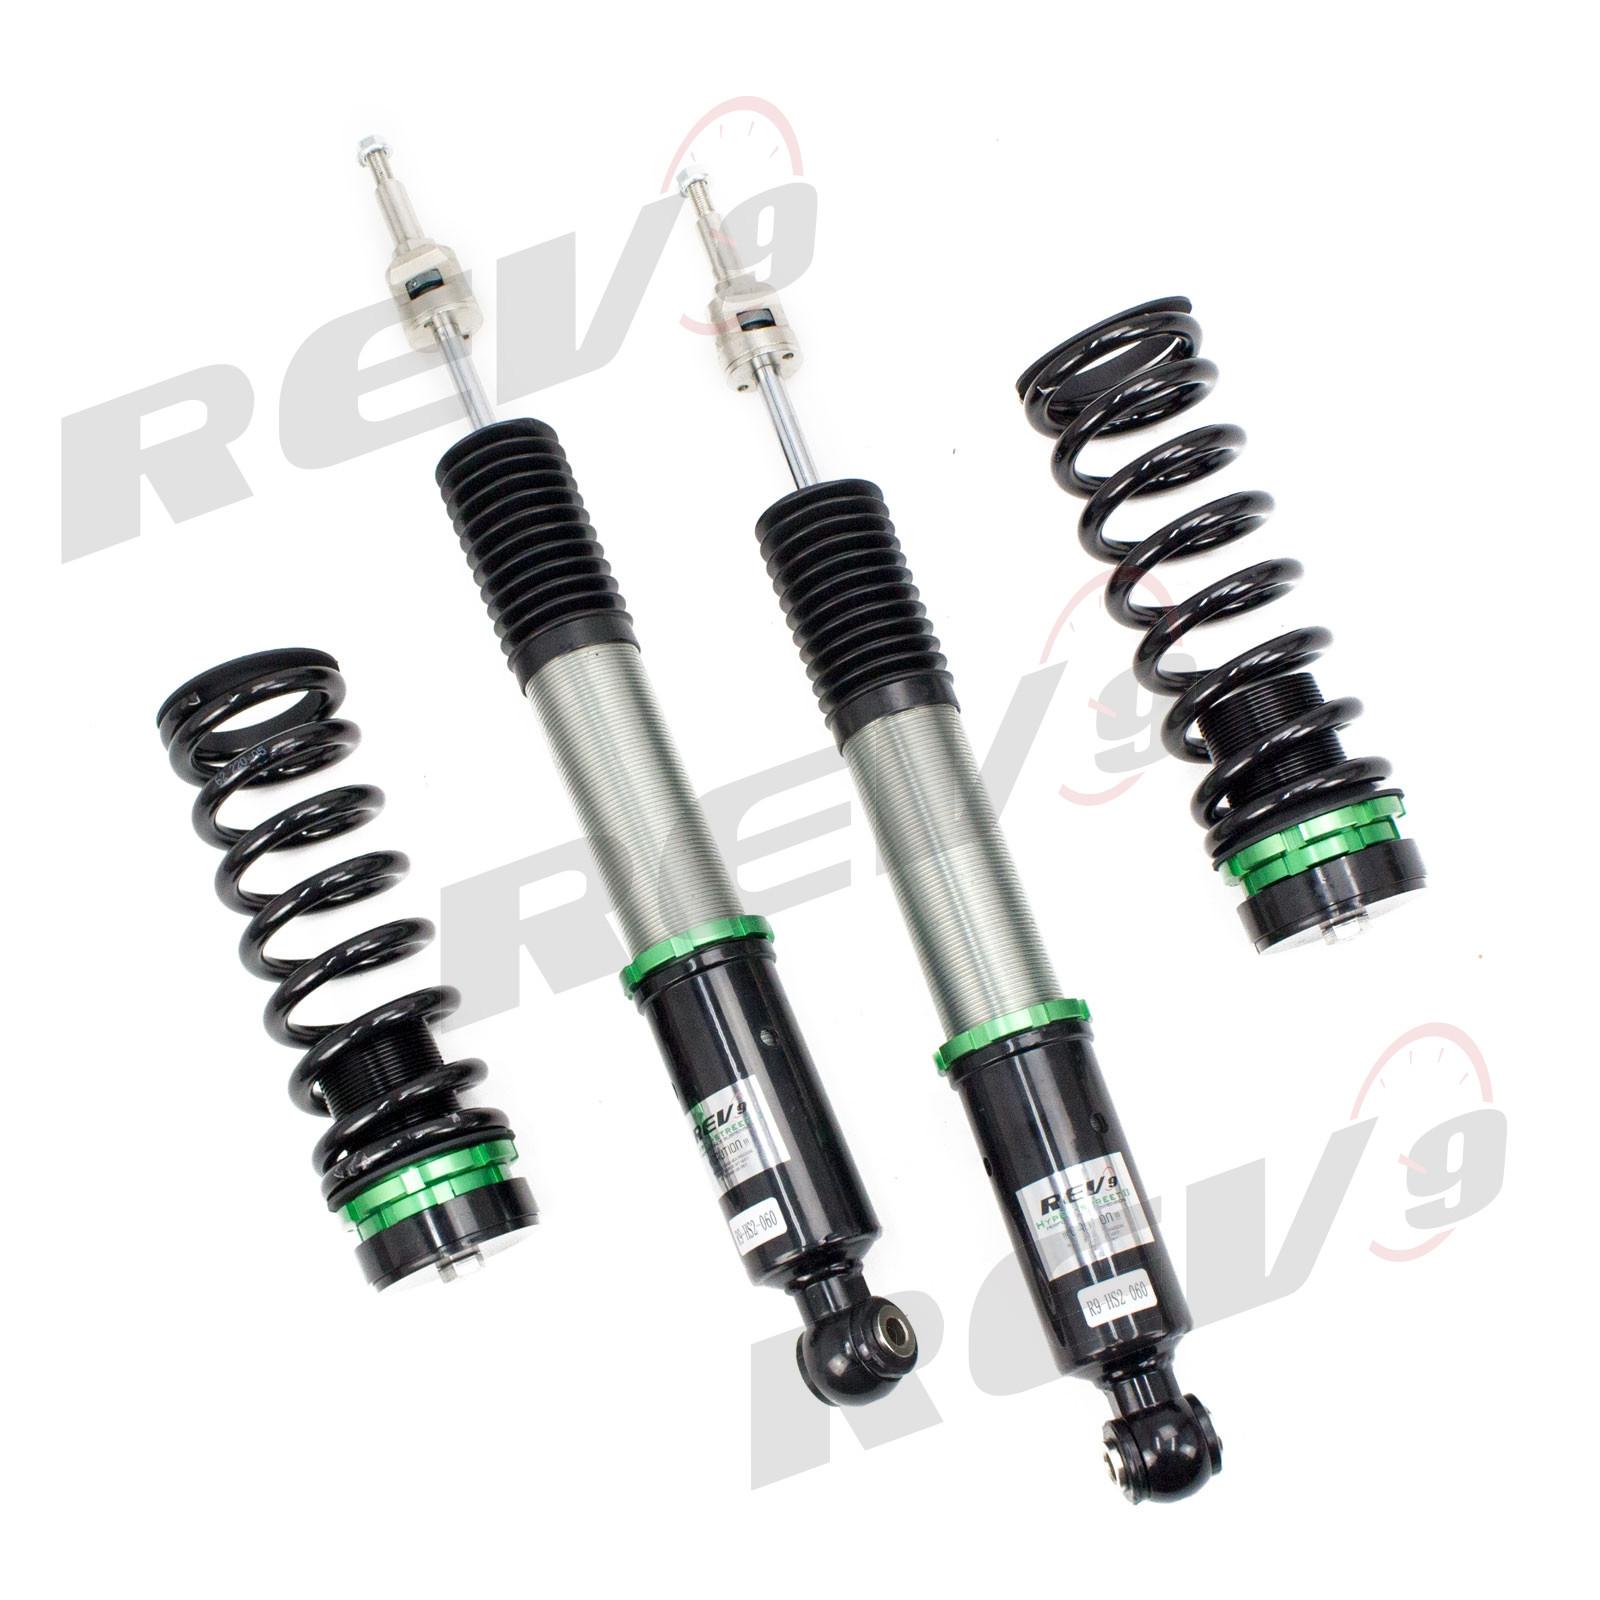 Rev9Power: Lowering Kit for Audi A3 / A3 QUATTRO/S3 (8V